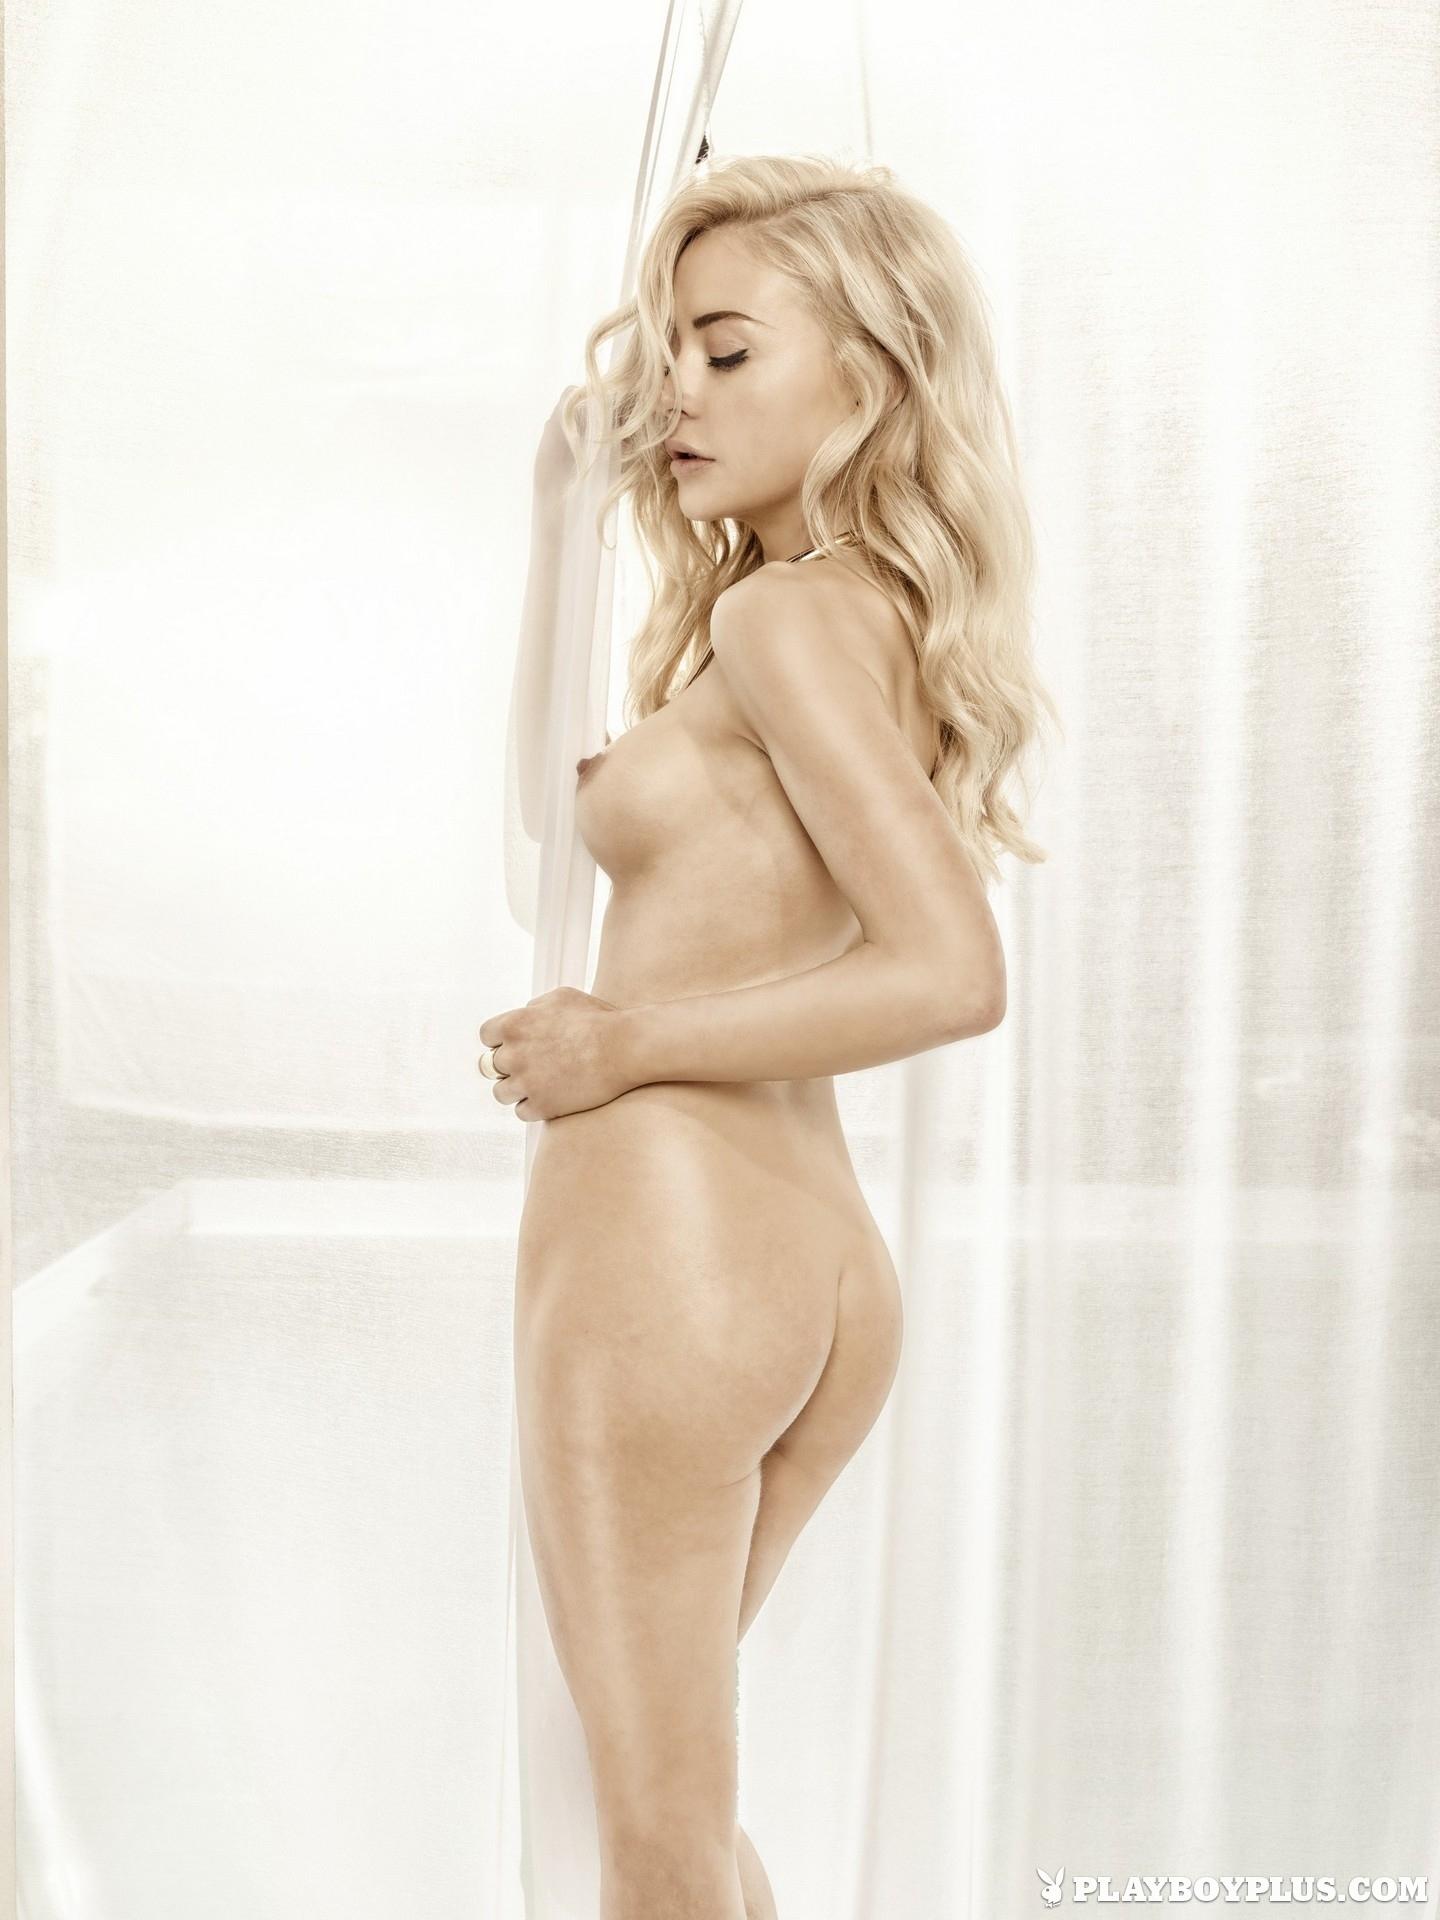 amber-bassick-blonde-nude-underwater-playboy-07